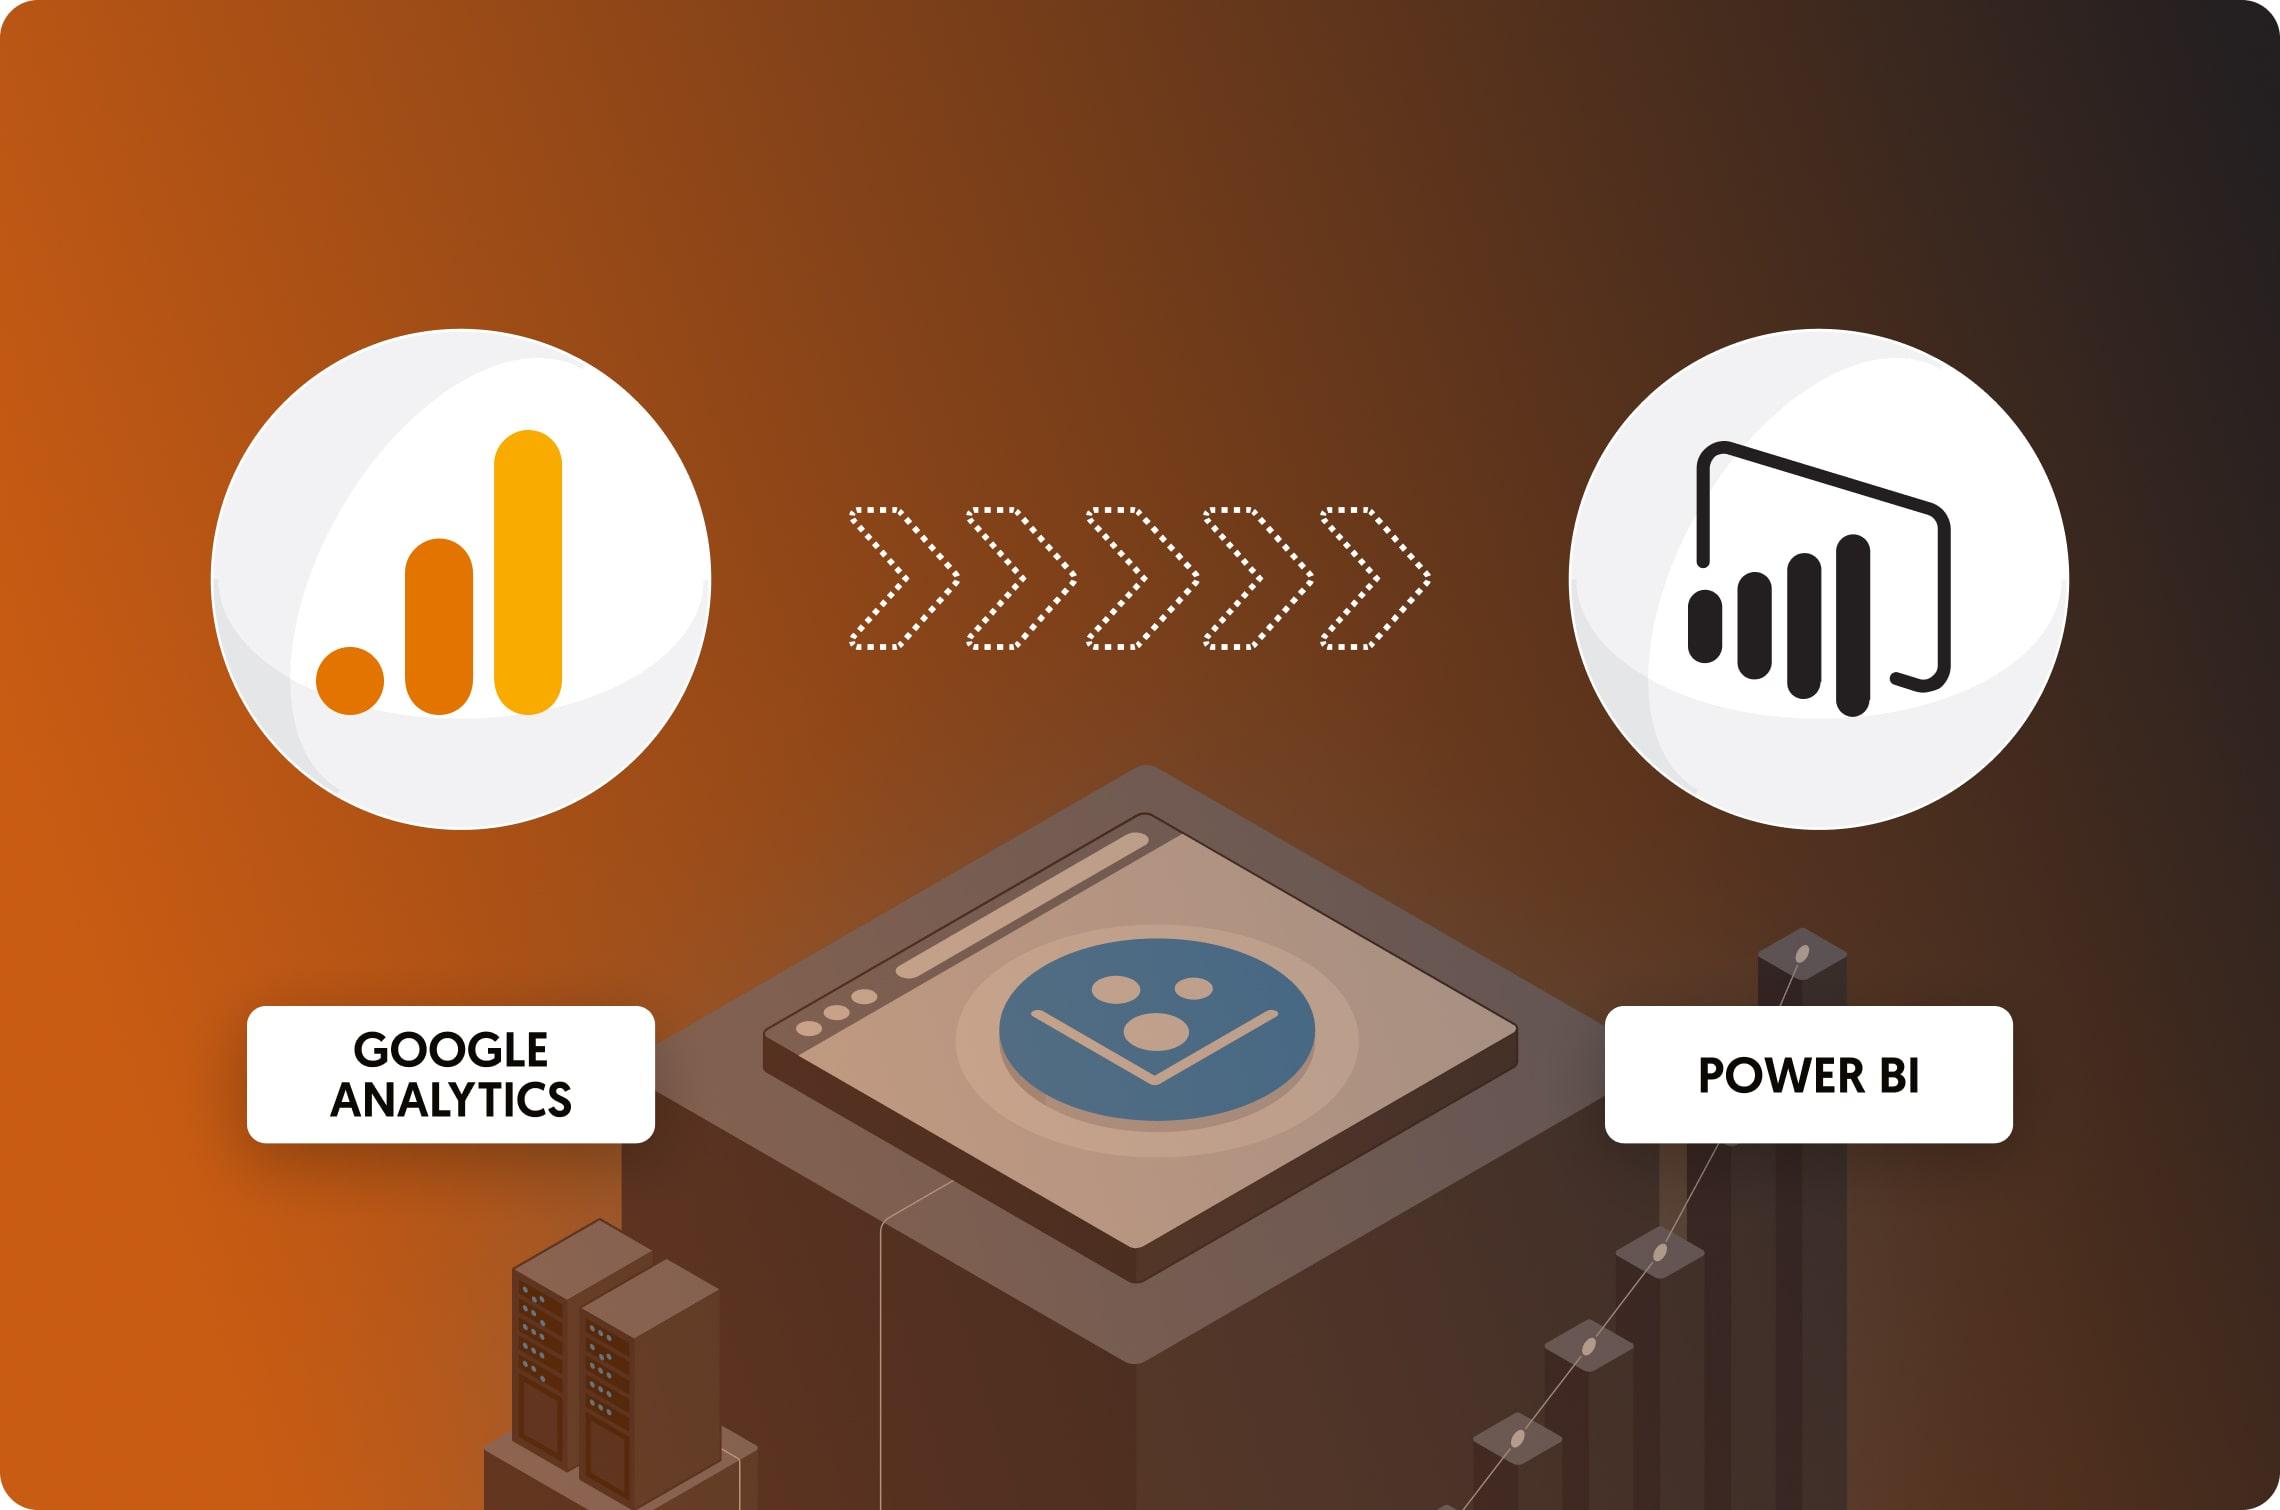 How to Connect Google Analytics to Power BI: Direct vs. Dataddo